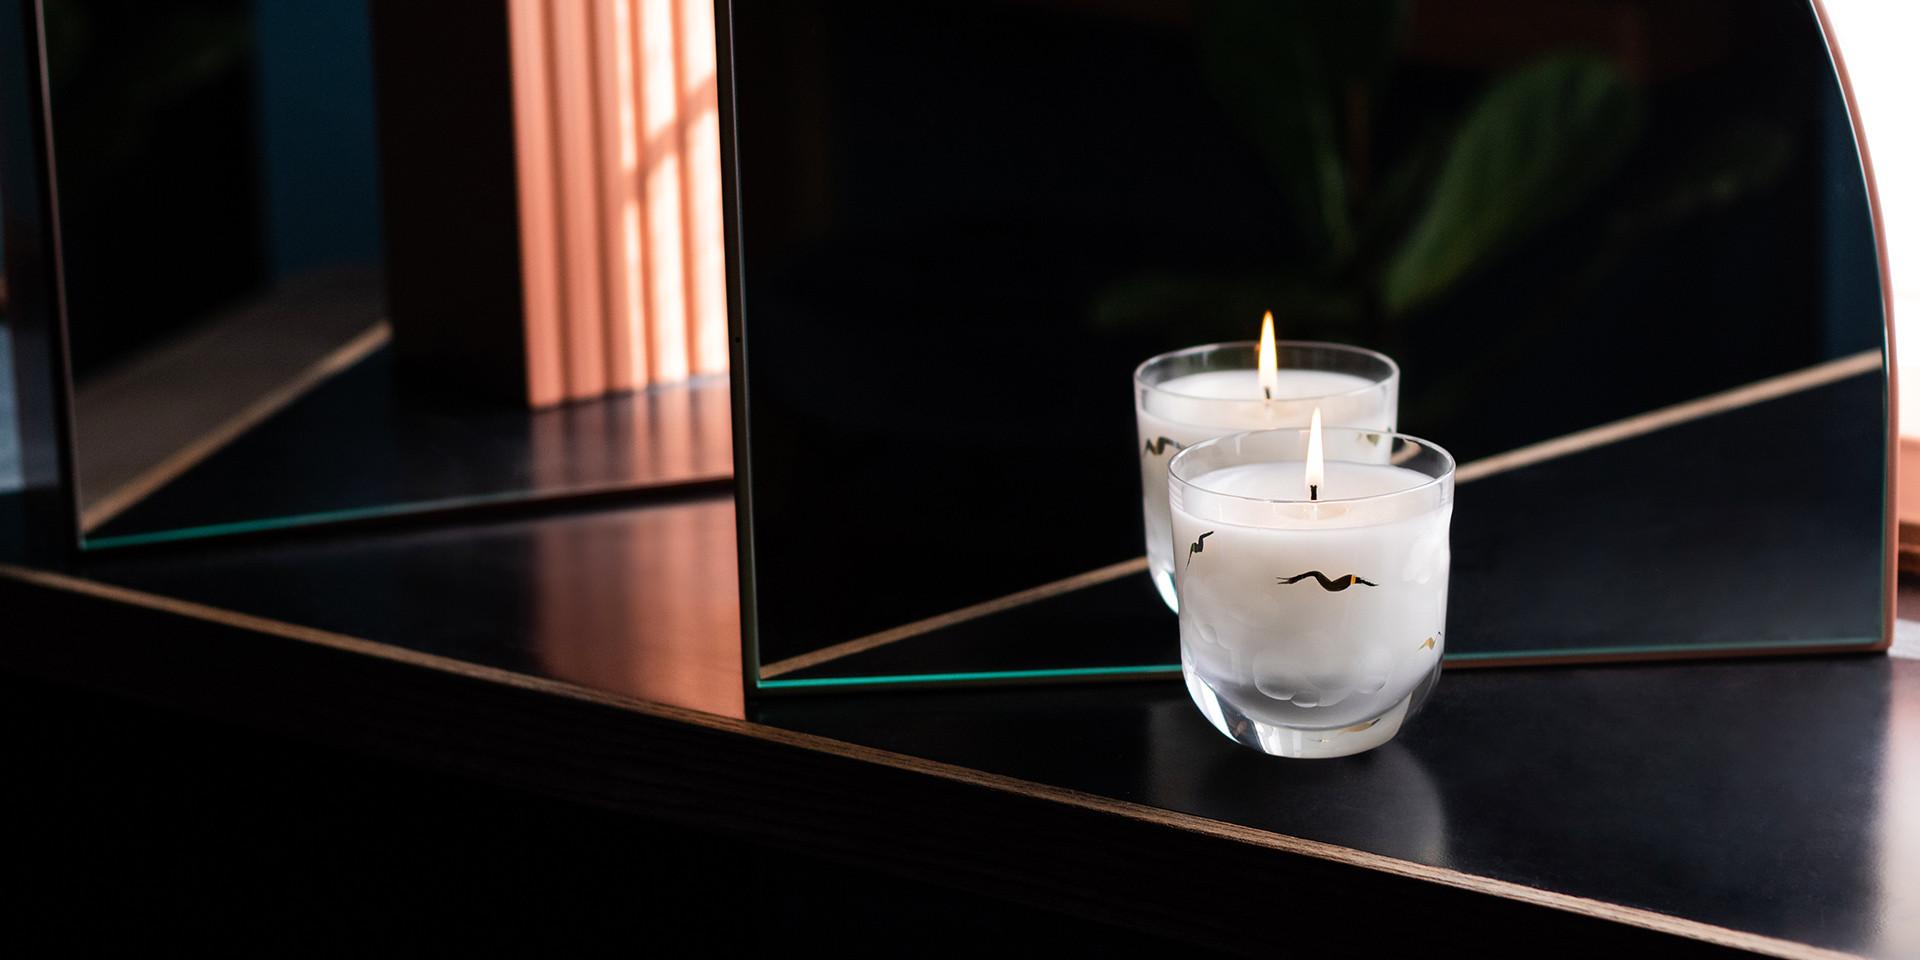 Rückl and Amnesty International presents Freedom Candle